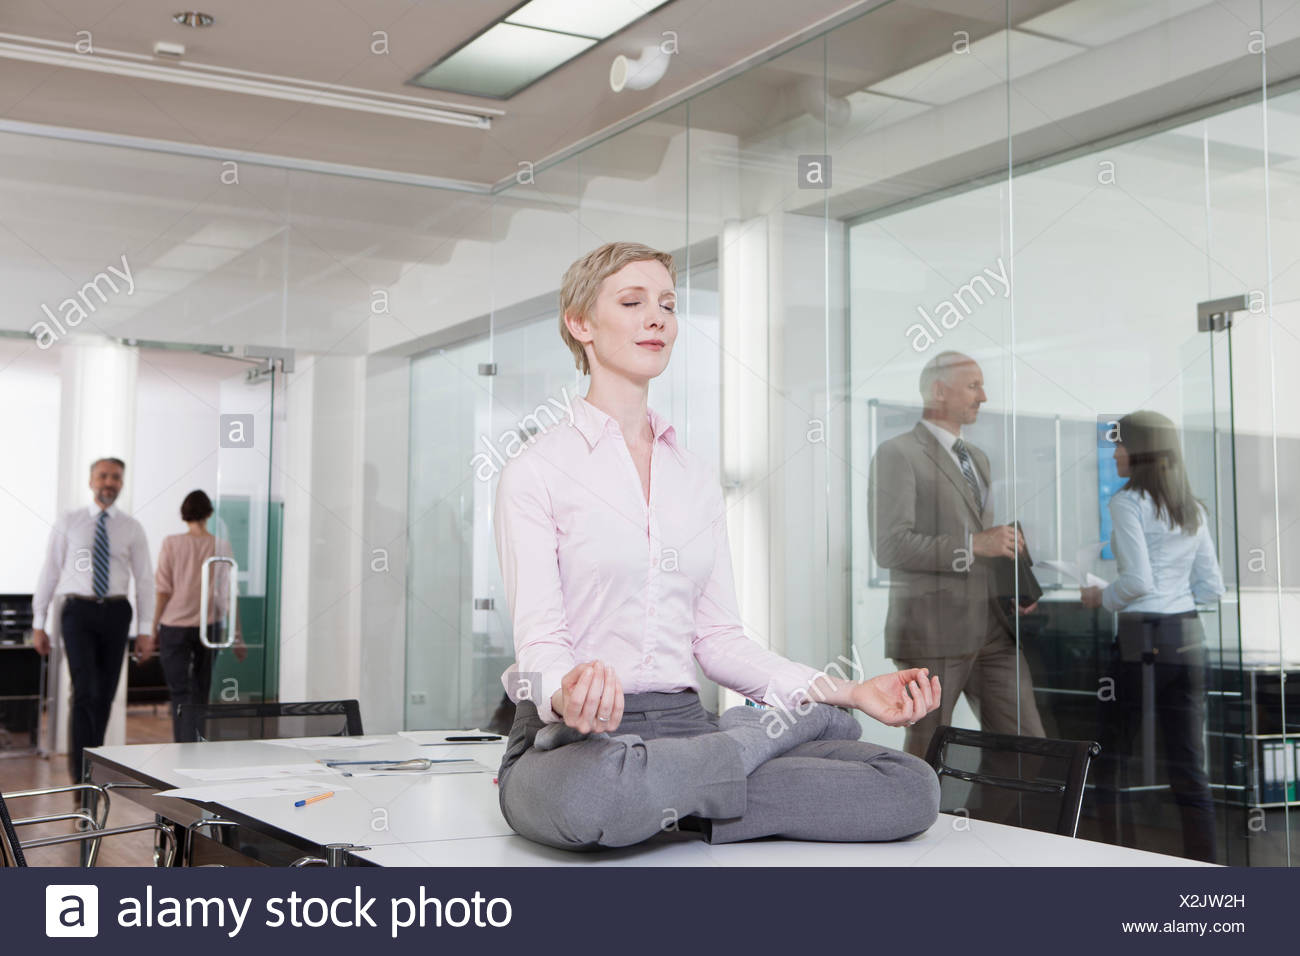 office meditation. Germany, Munich, Businesswoman In Office, Meditating On Desk - Stock Image Office Meditation